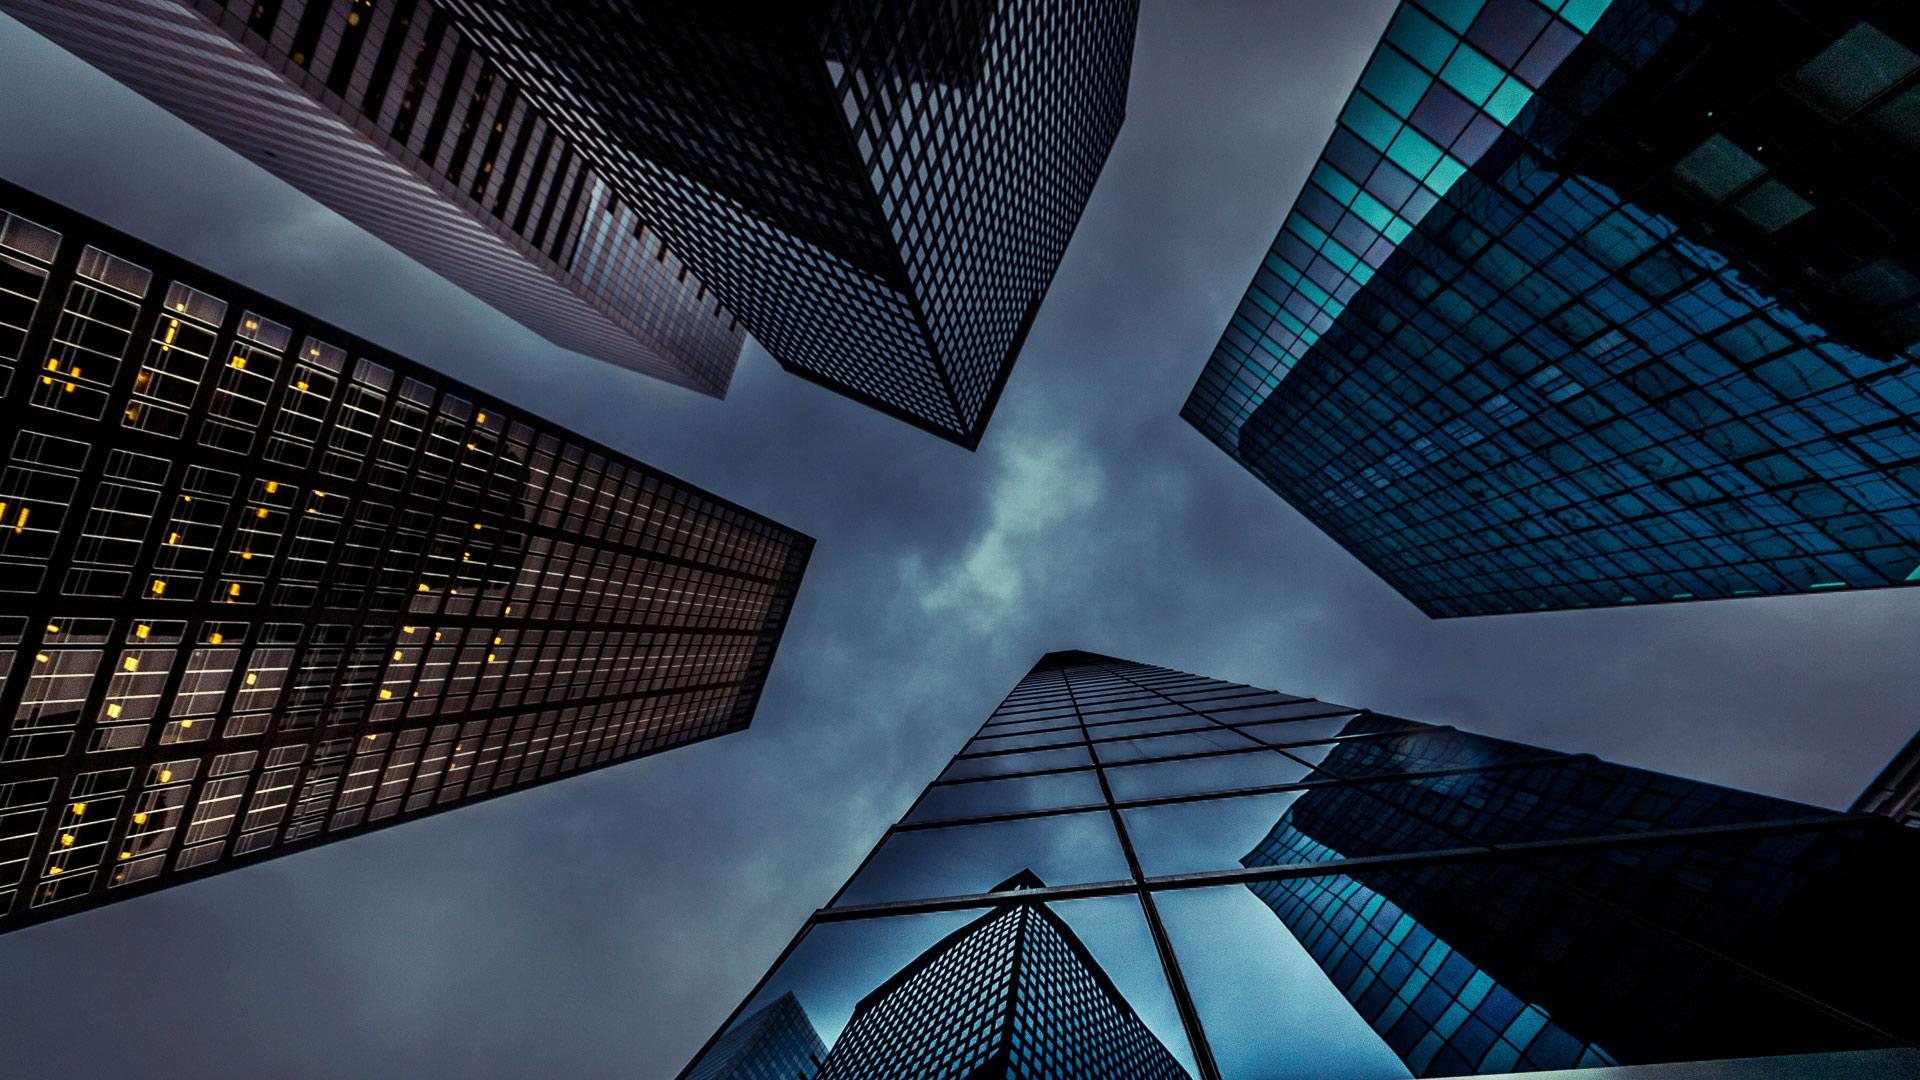 Four Corners Manhattan New York City Usa Windows 10 Spotlight